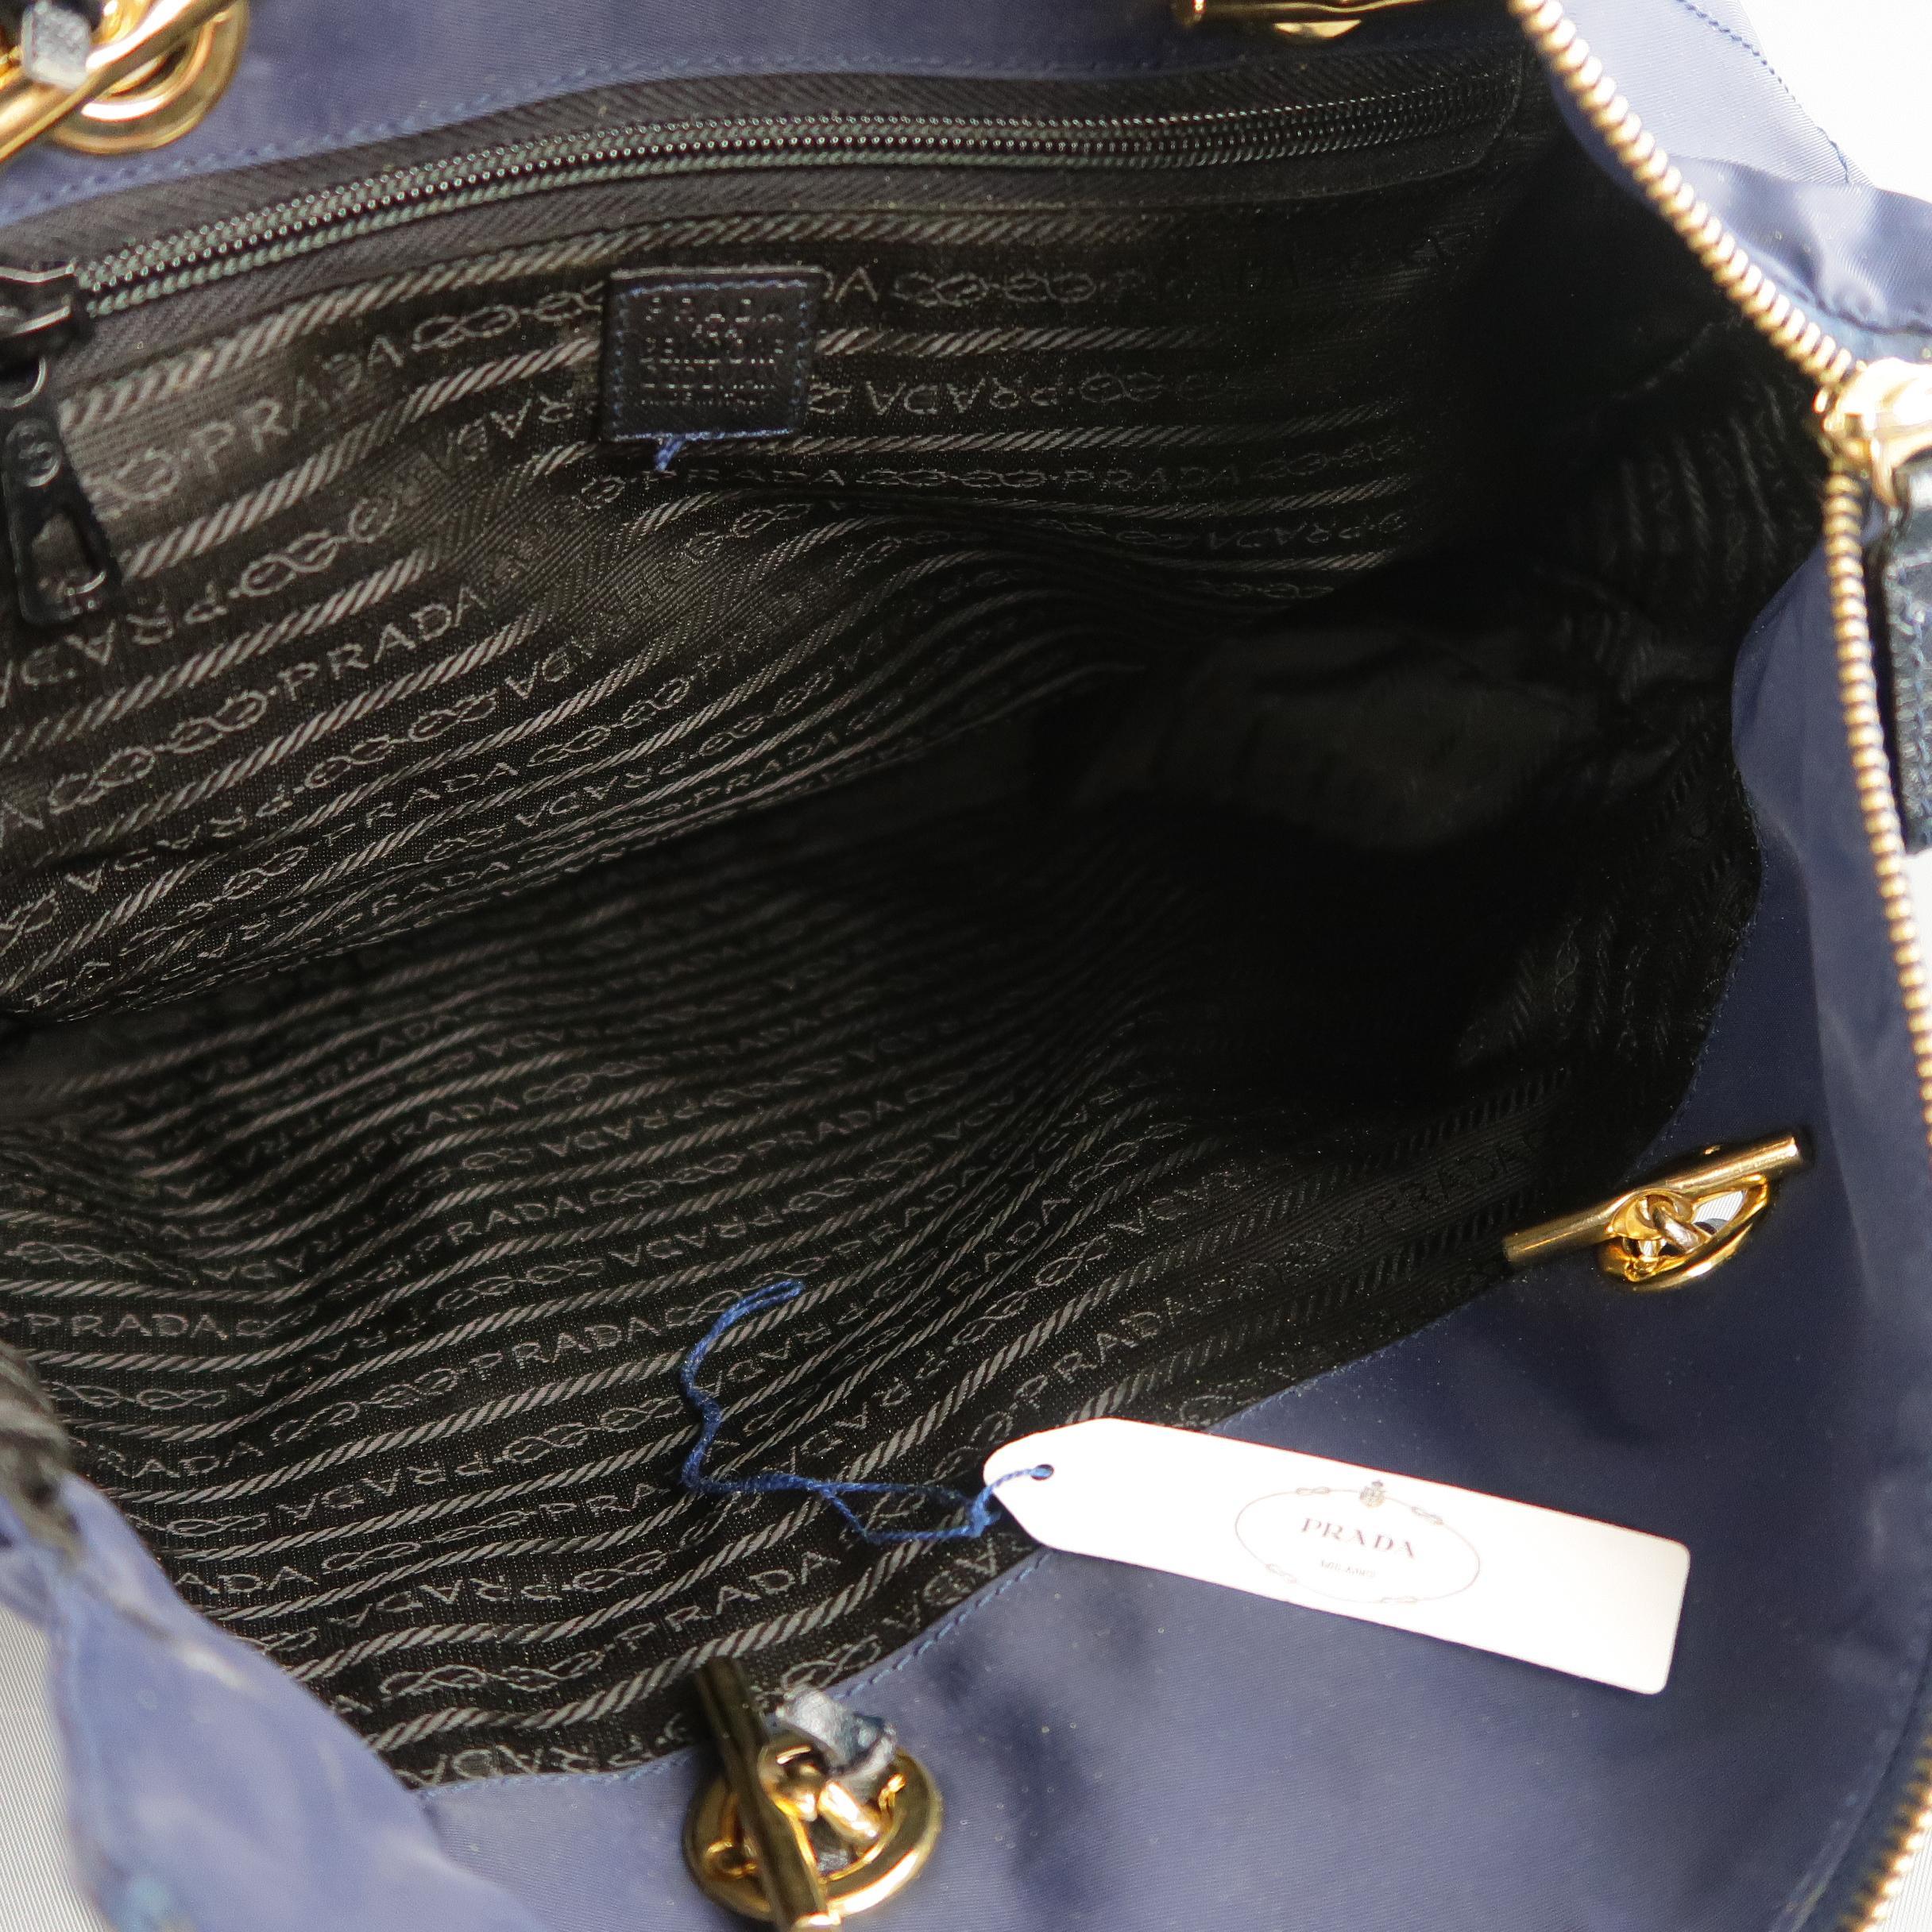 114f16b7d02b Prada Vintage Navy Quilted Nylon Gold Chain Straps Shoulder Bag at 1stdibs